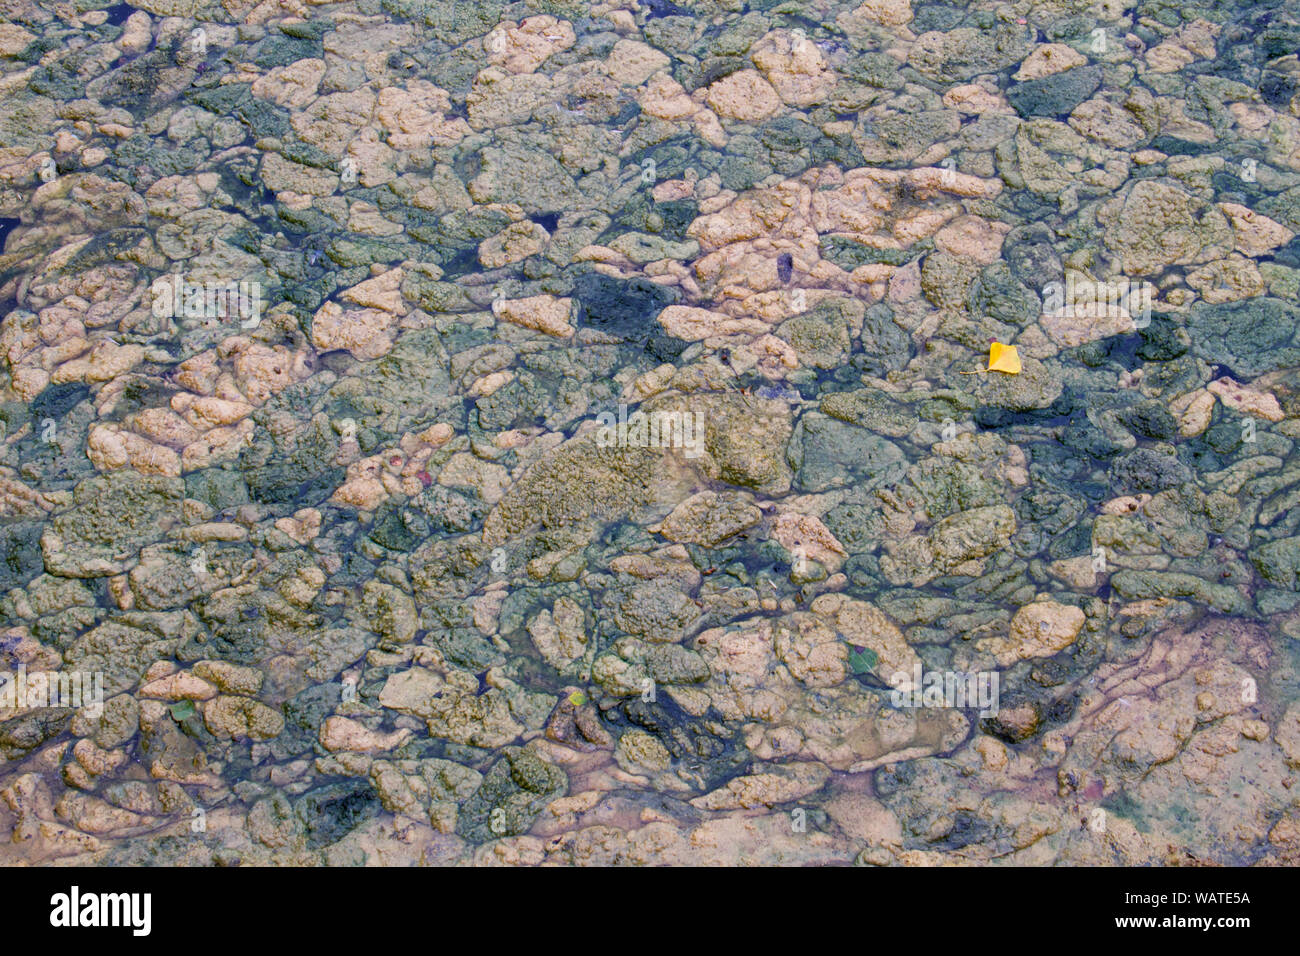 Dense covering of rotting algae on a pond Stock Photo